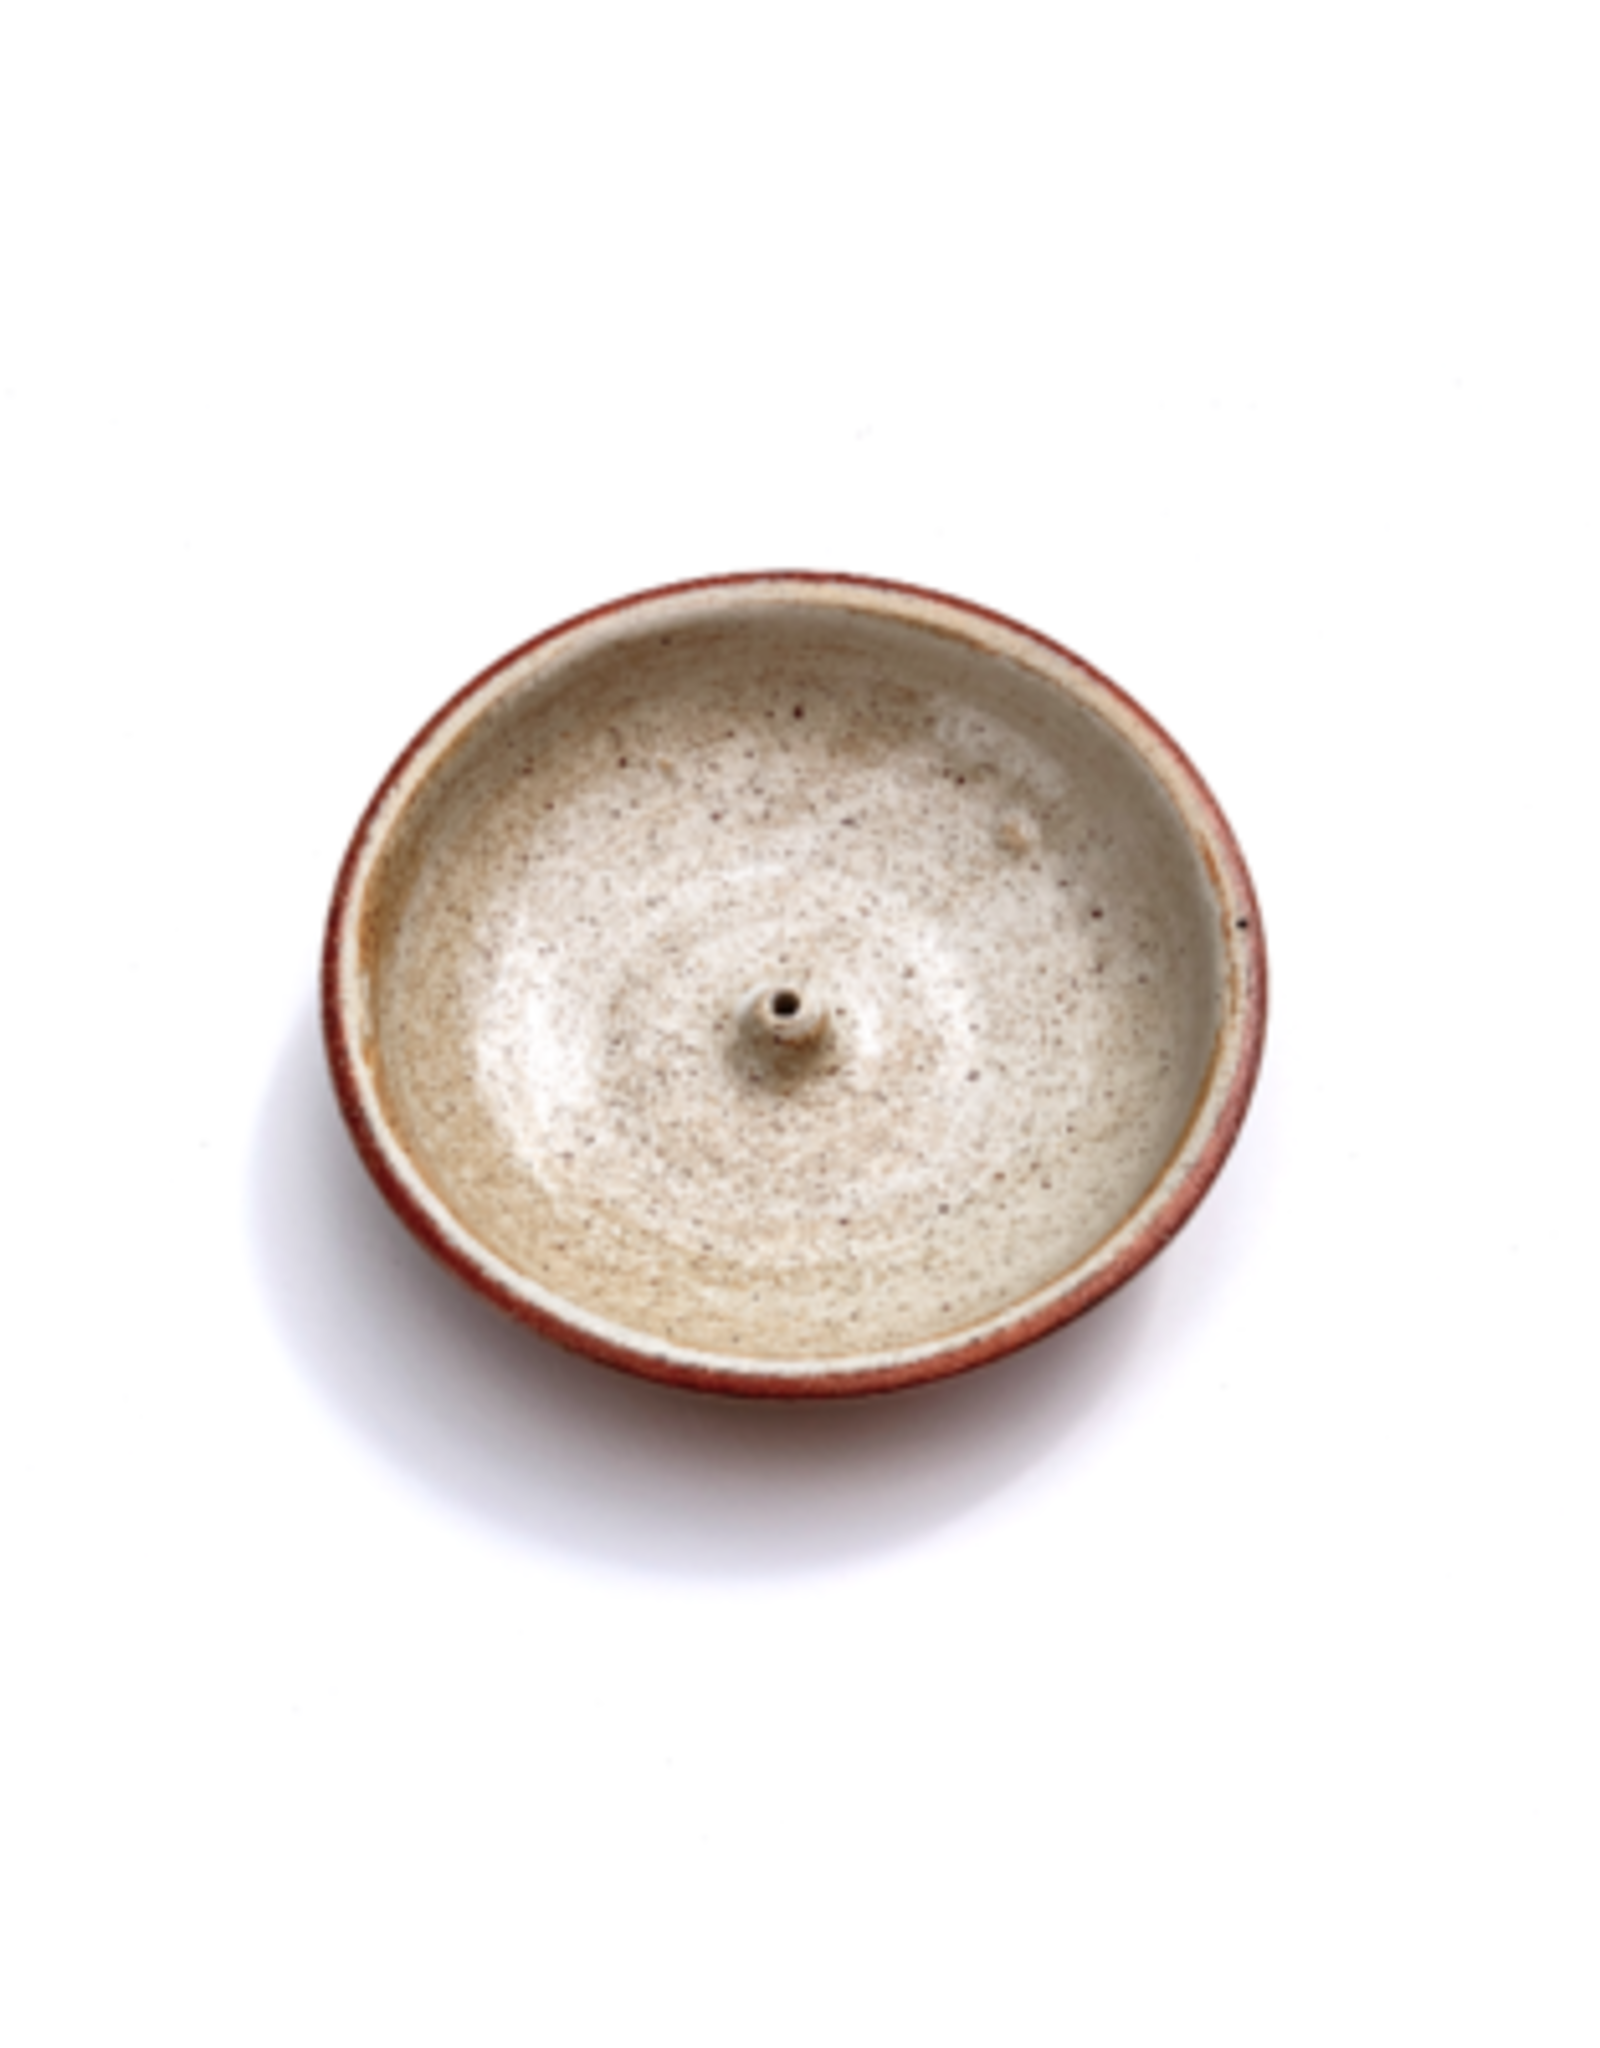 Incausa Stoneware Incense Burner - Piker White